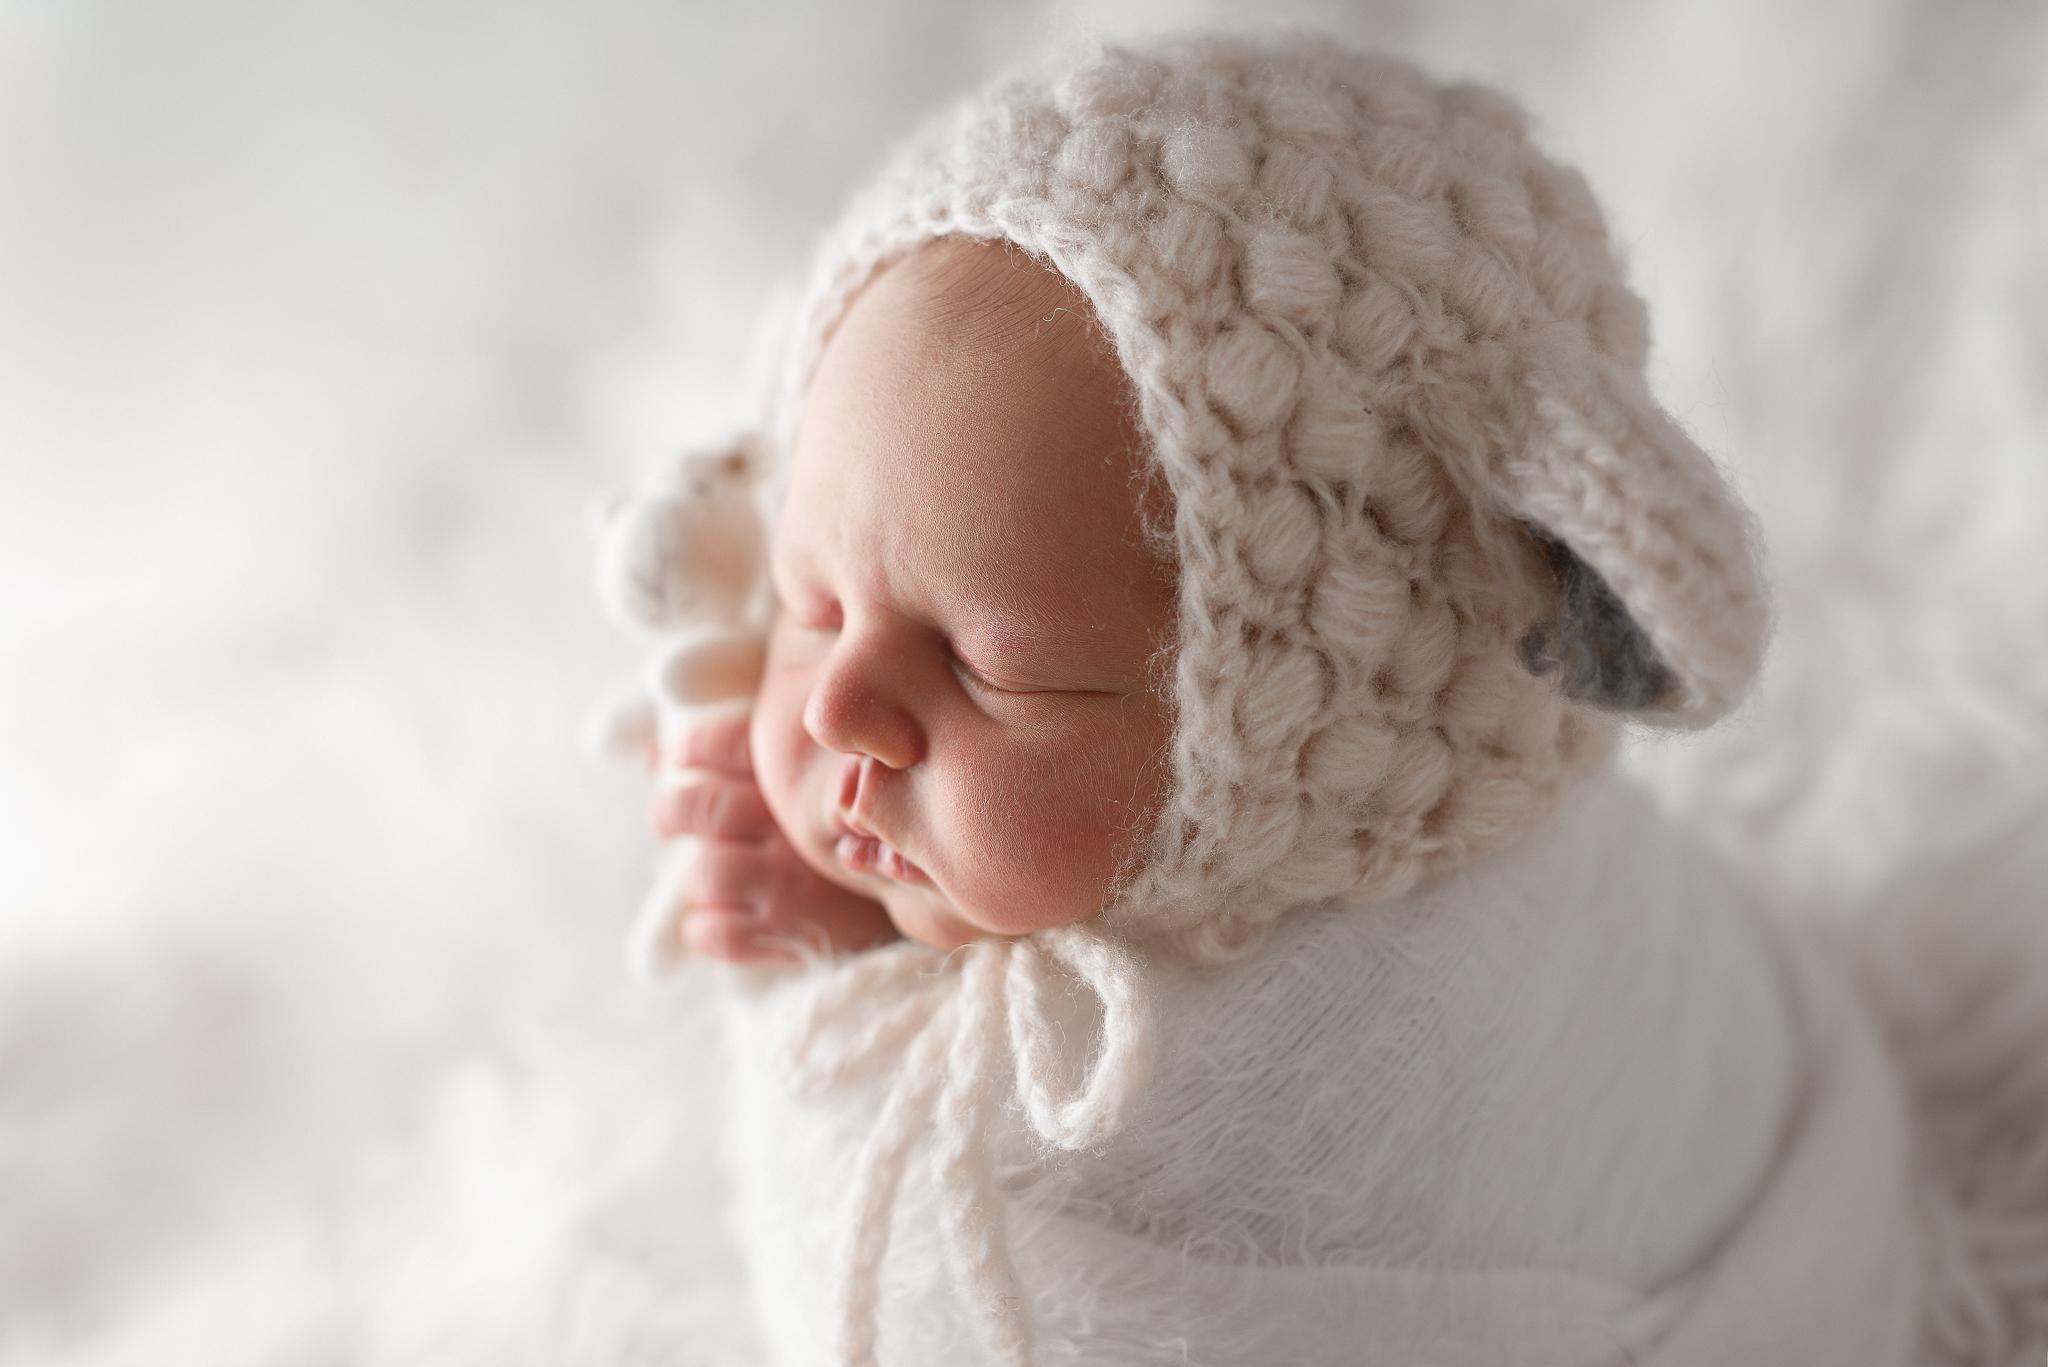 Newborn29NaomiLuciennePhotography032019-Edit-3.jpg